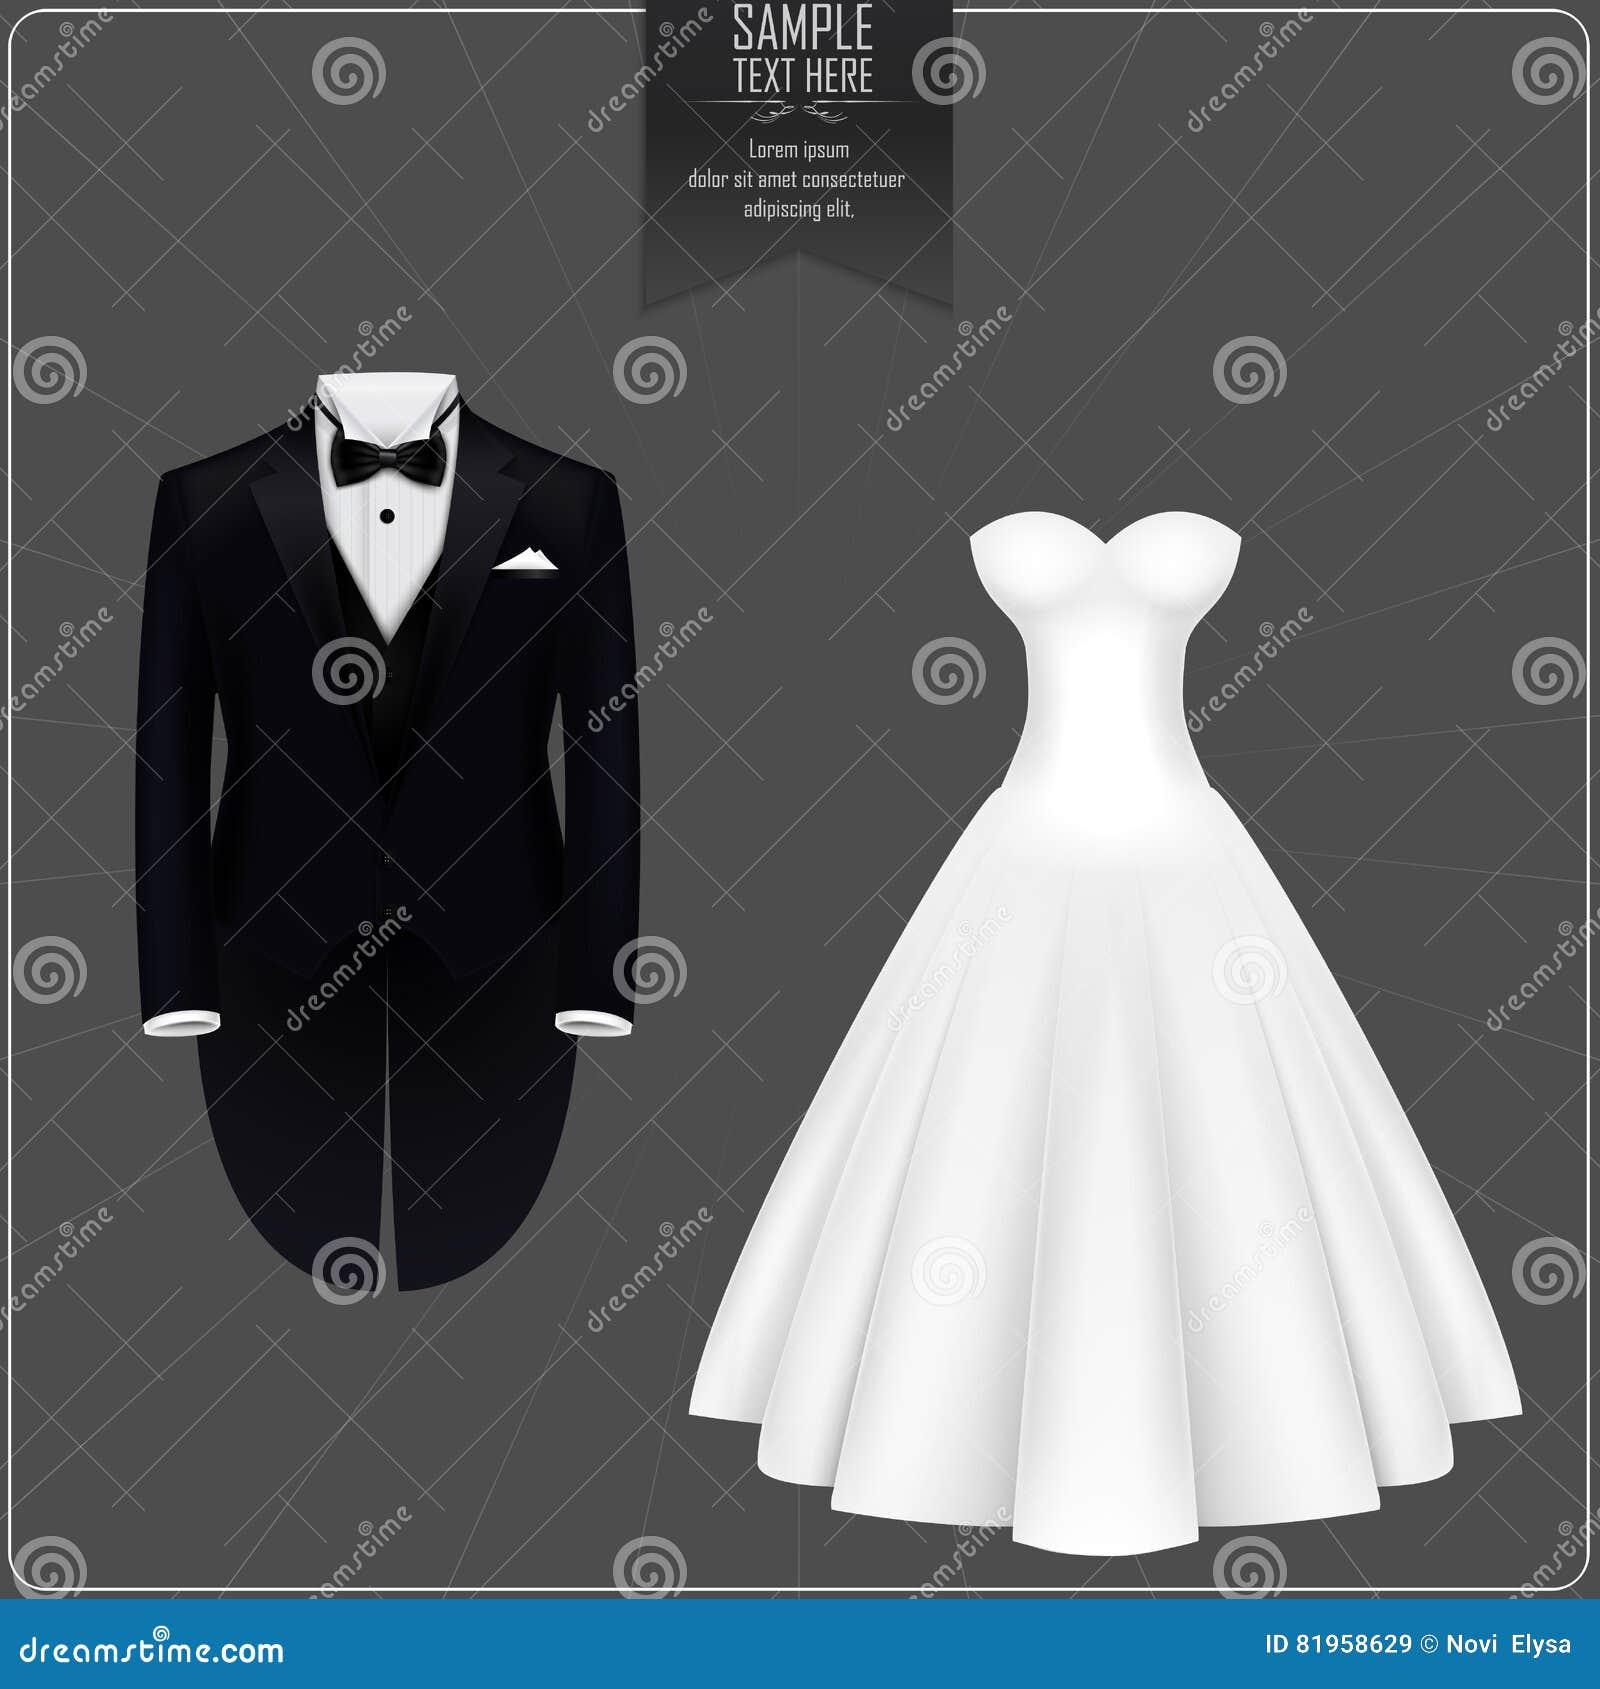 Tuxedo And Bridal Gown Cartoon Vector